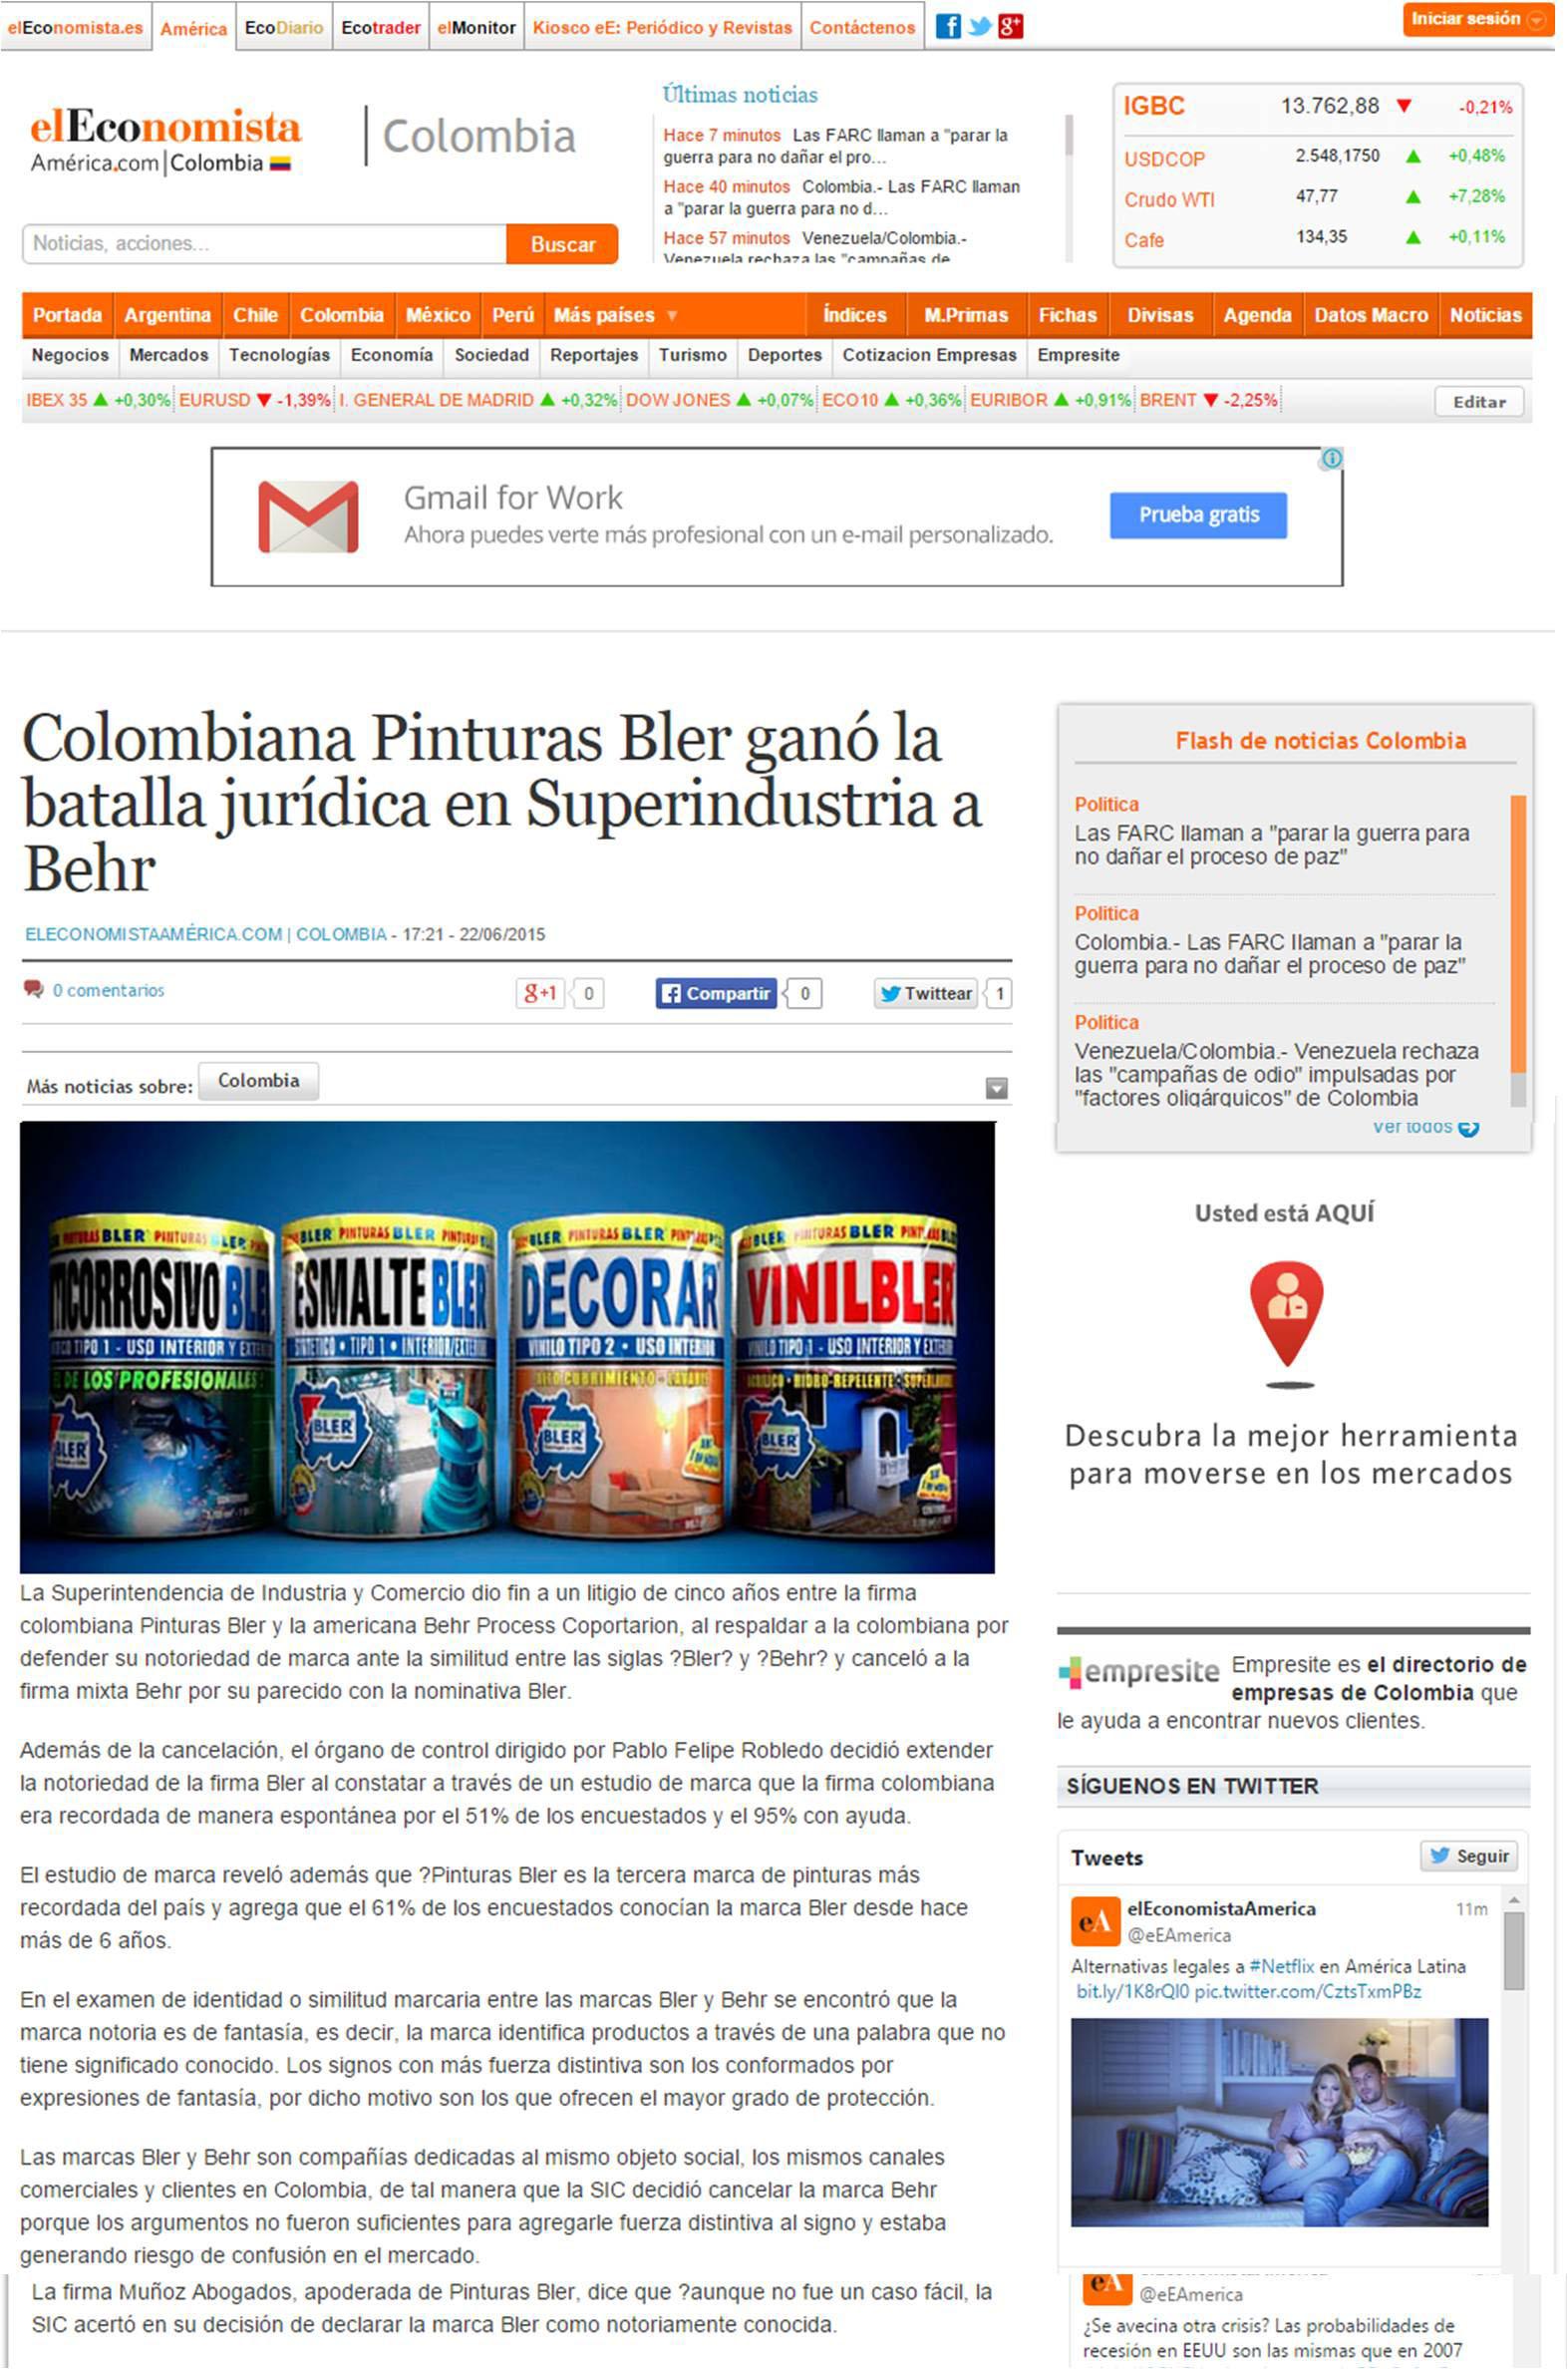 Eleconomistaamerica.com 22 de Junio [web]